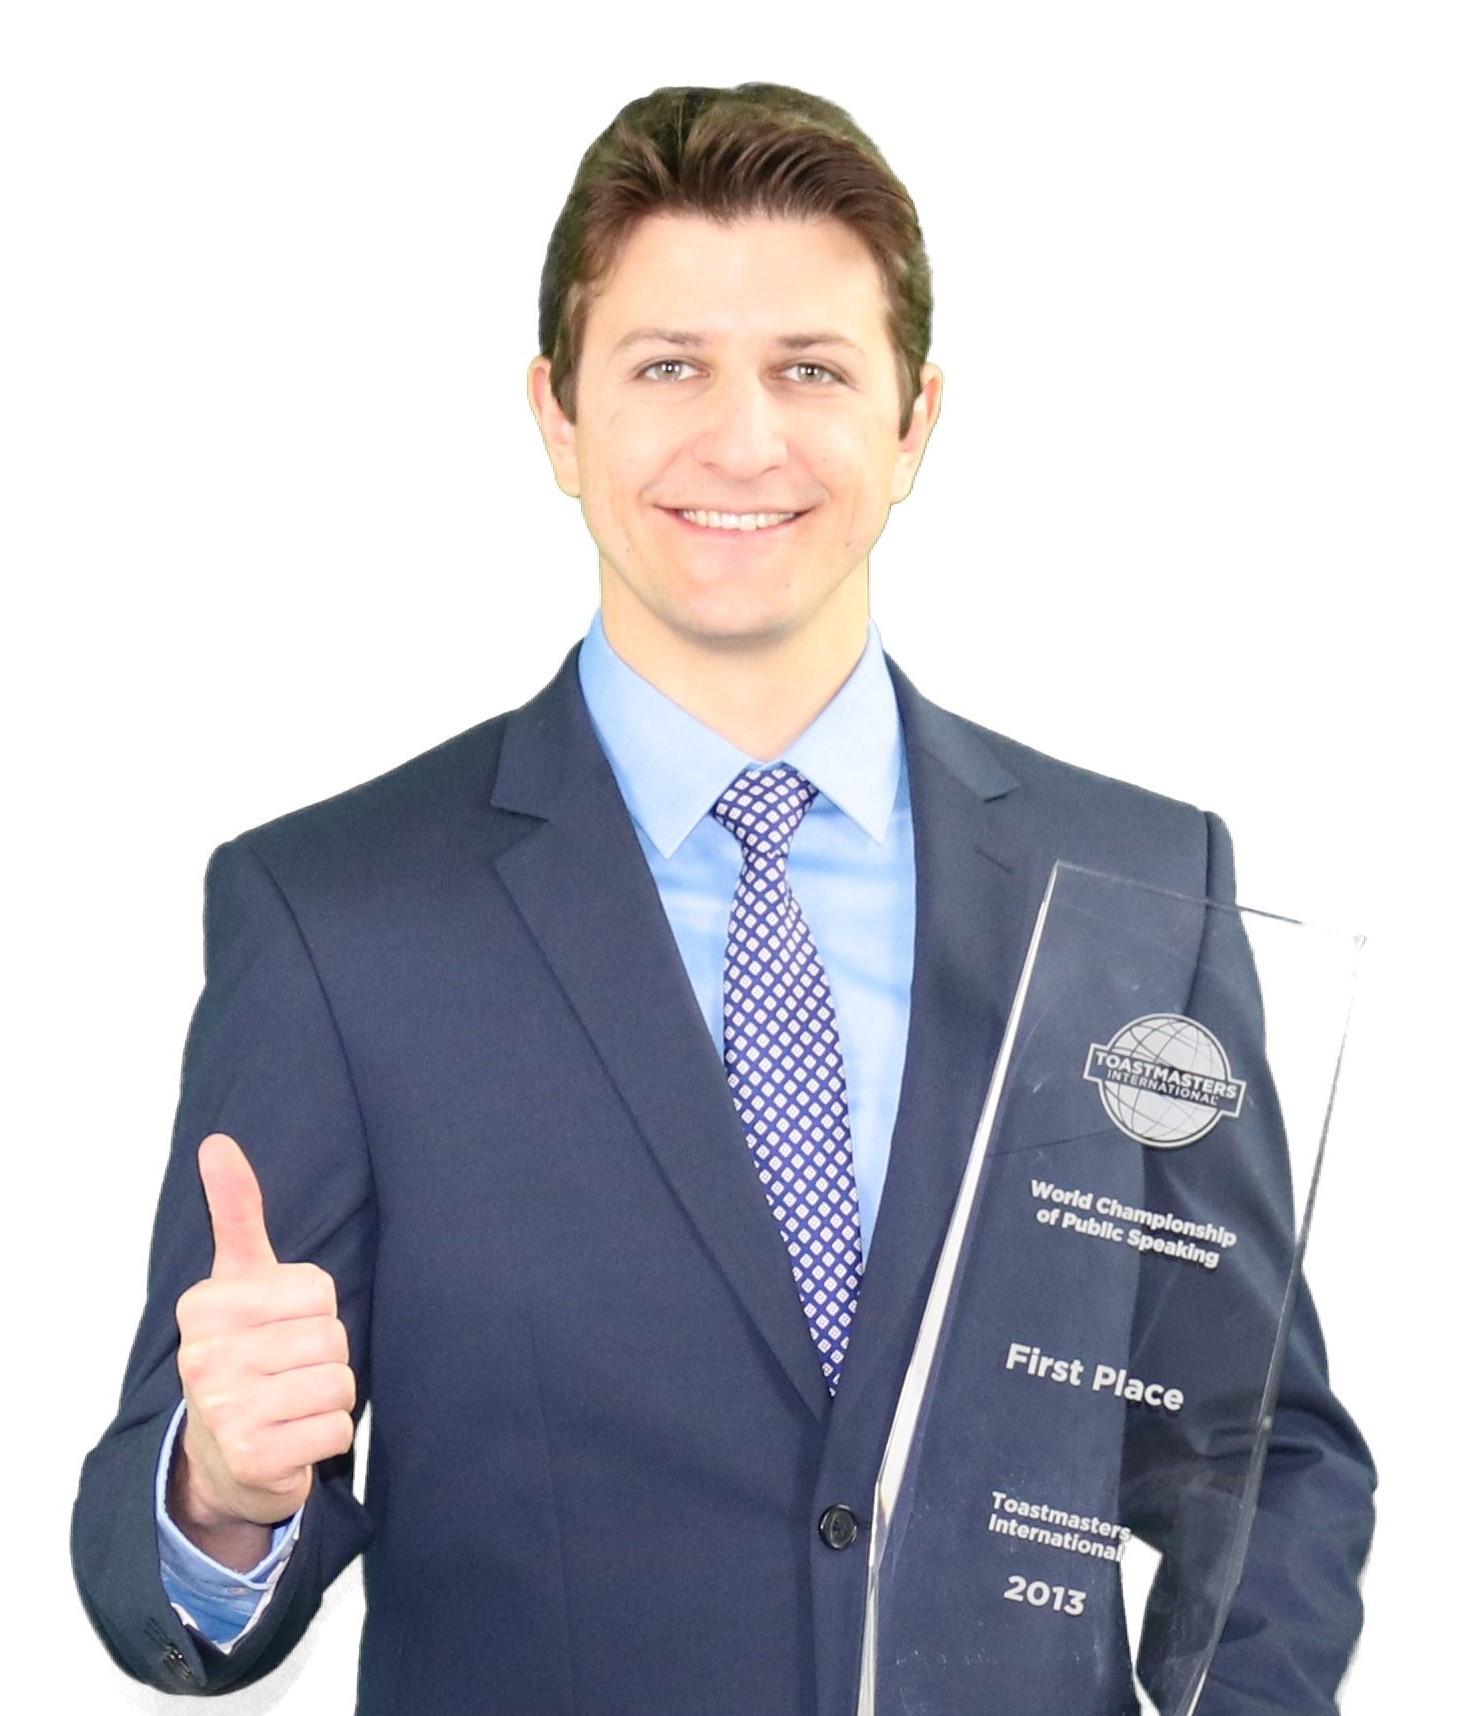 Pres Vasilev, Workshop Leader